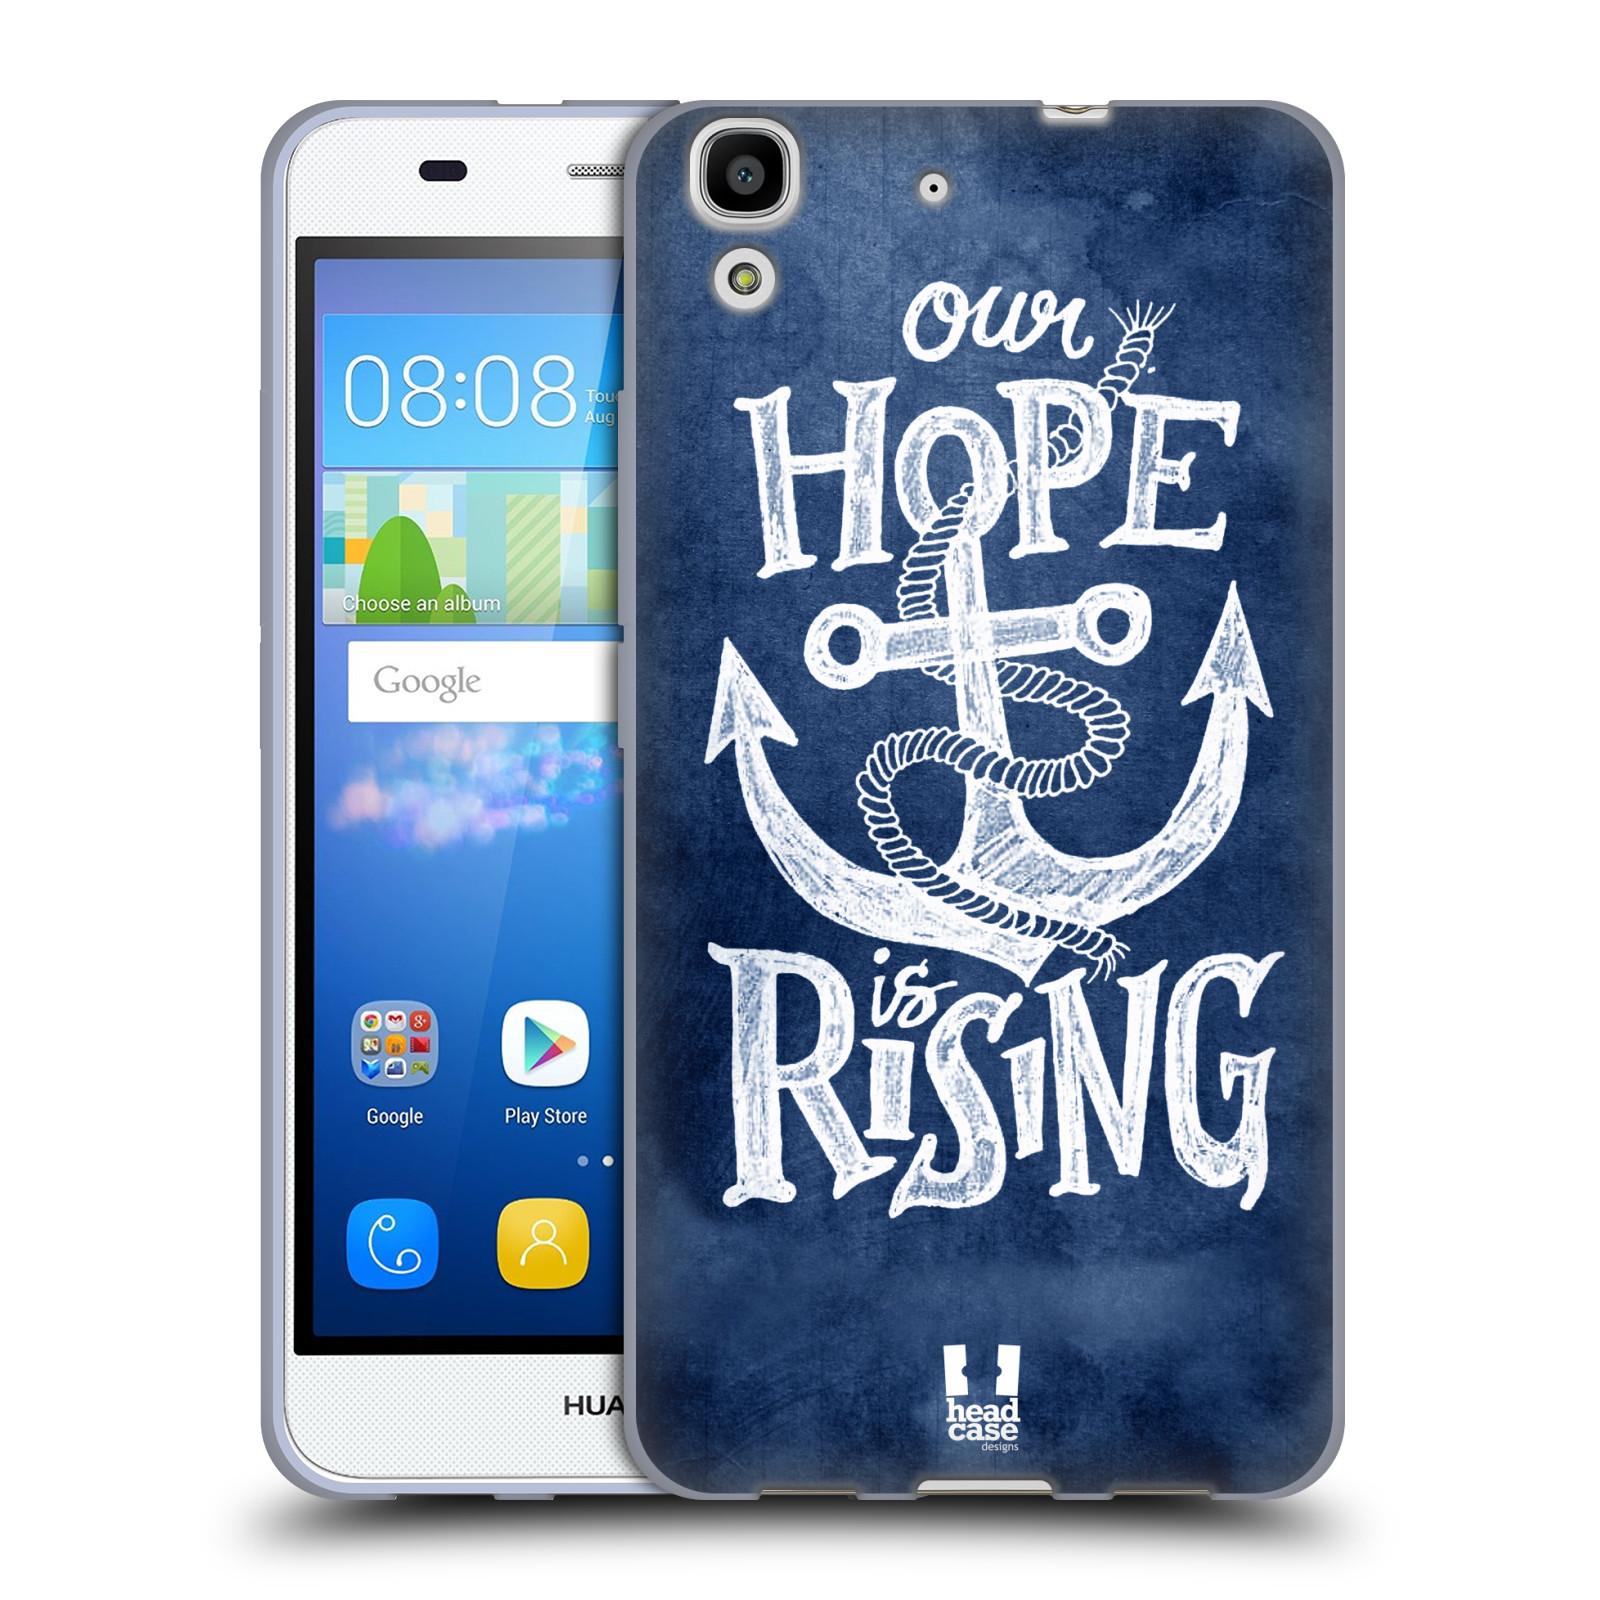 Silikonové pouzdro na mobil Huawei Y6 HEAD CASE KOTVA RISING